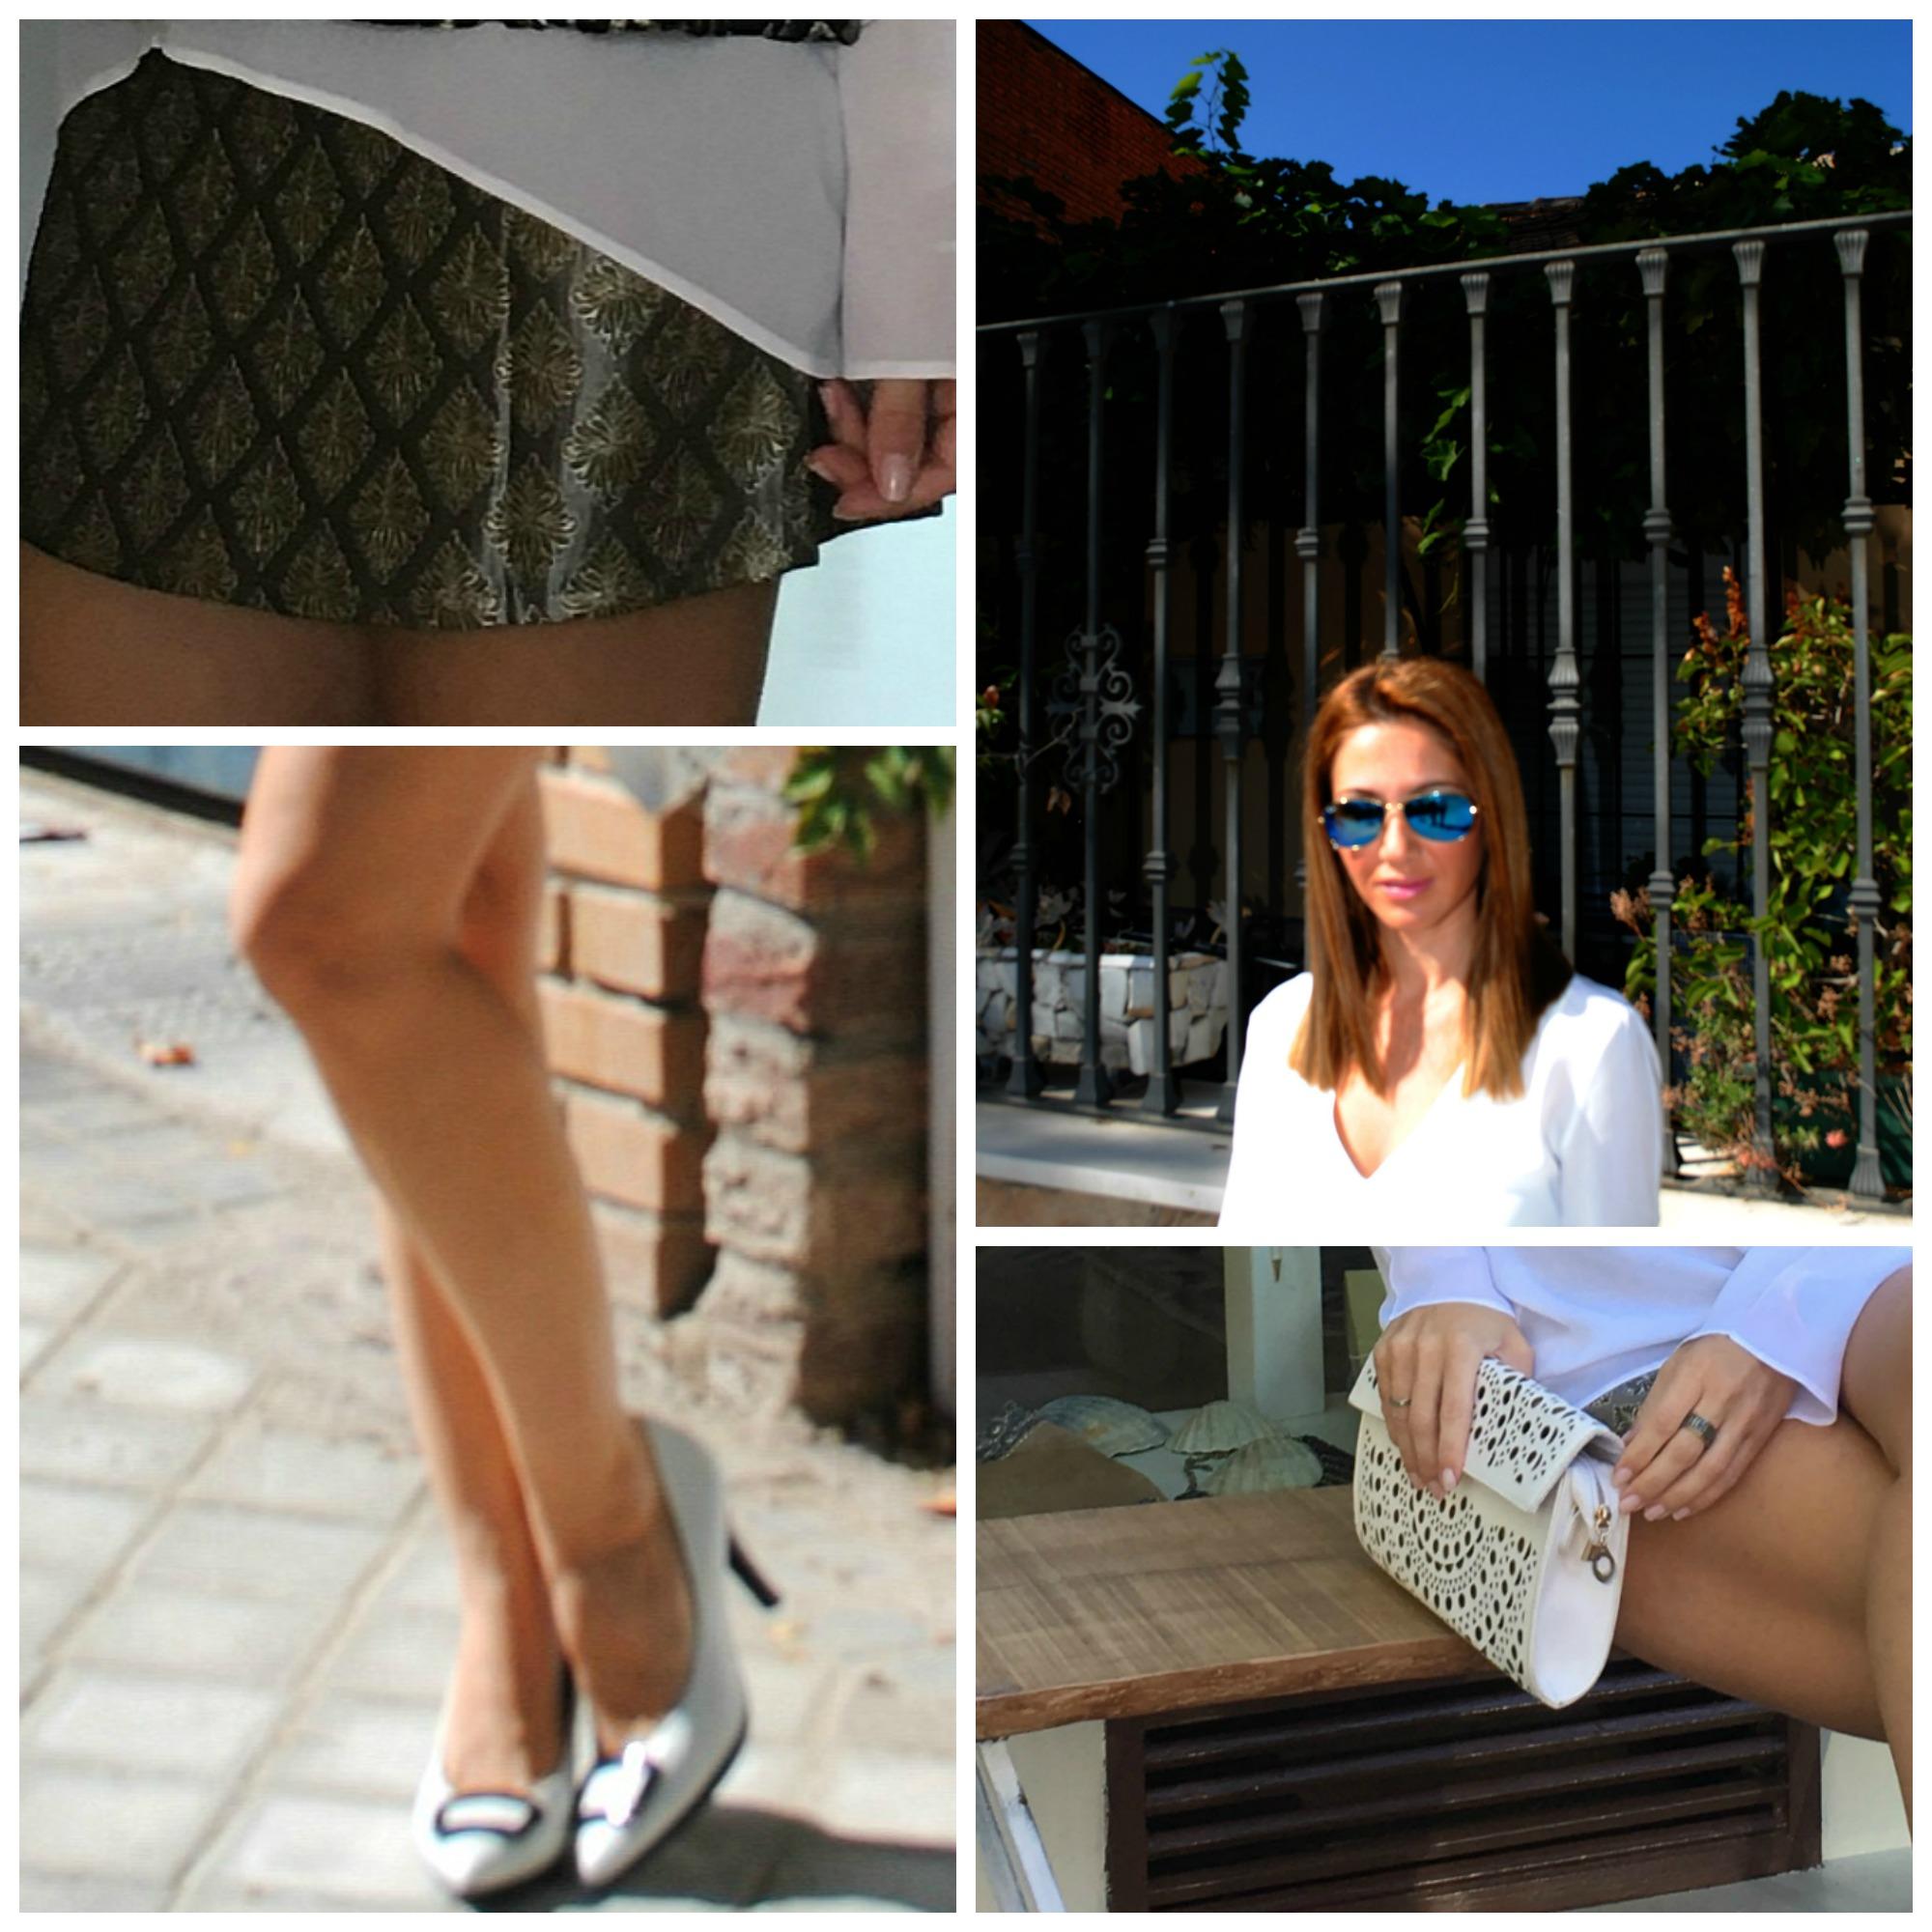 Skirt: NOTRE MAISON; Shoes: HISPANITAS; Blouse: ZARA; Bag: Vintage; Sunnies: Ray-Ban